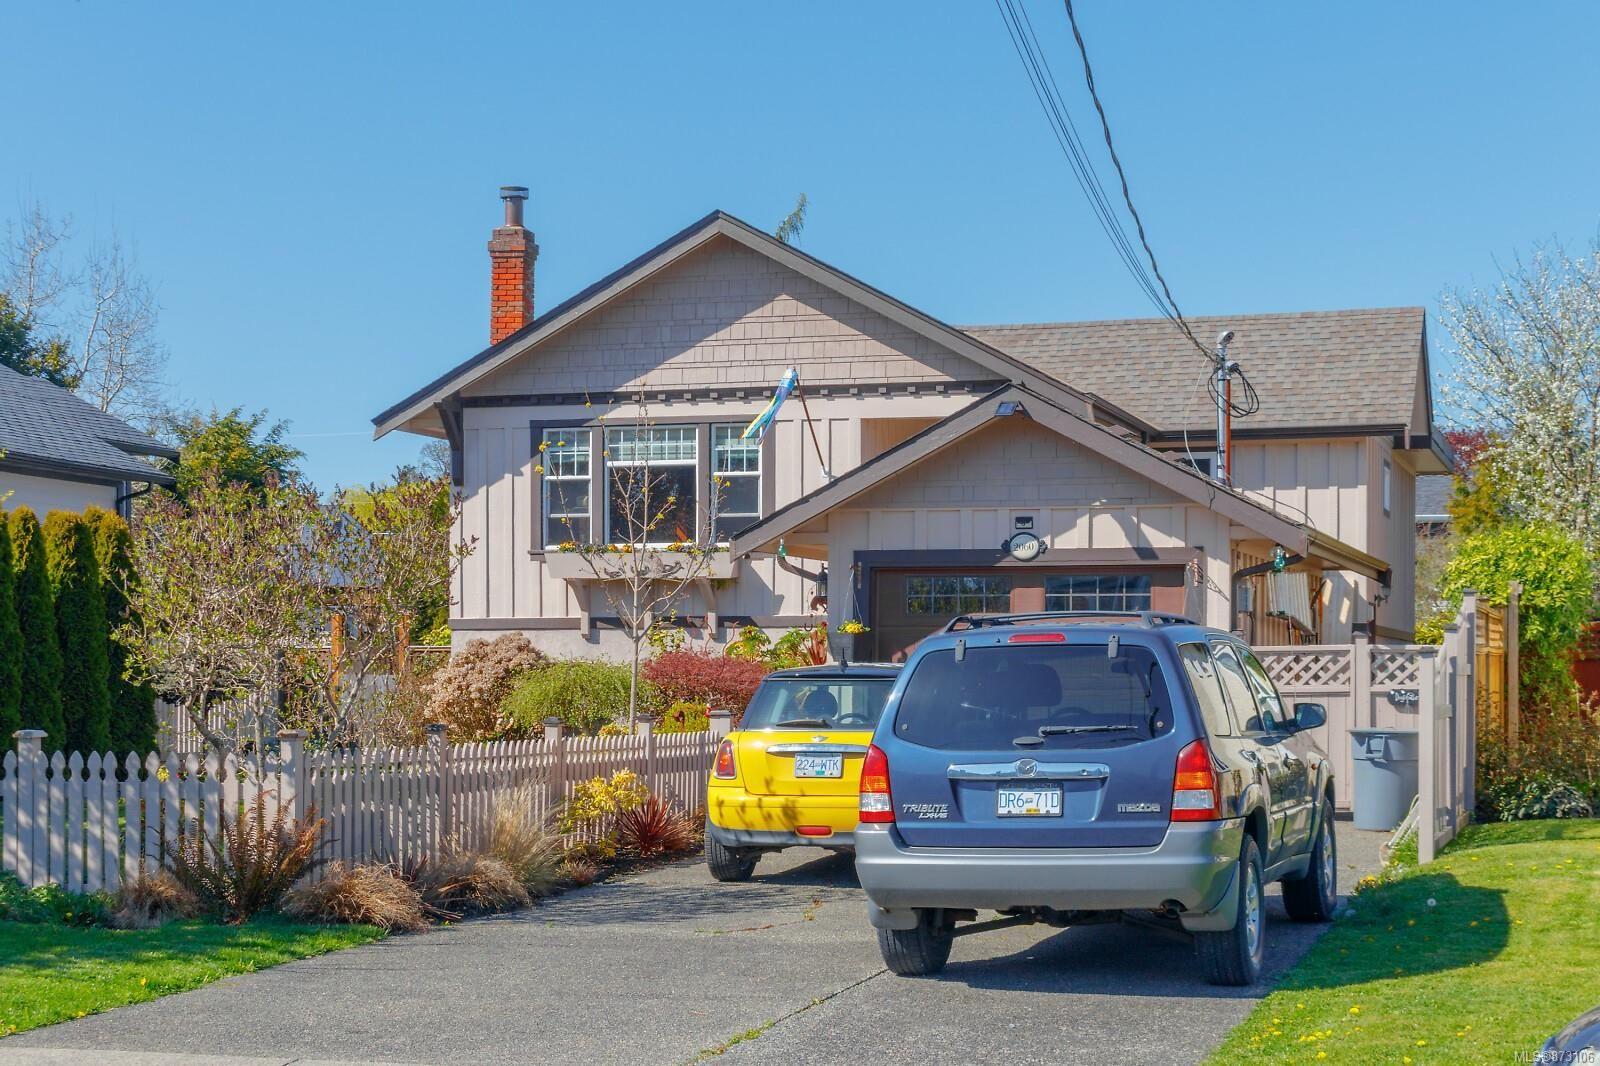 Main Photo: 2060 Townley St in : OB Henderson House for sale (Oak Bay)  : MLS®# 873106